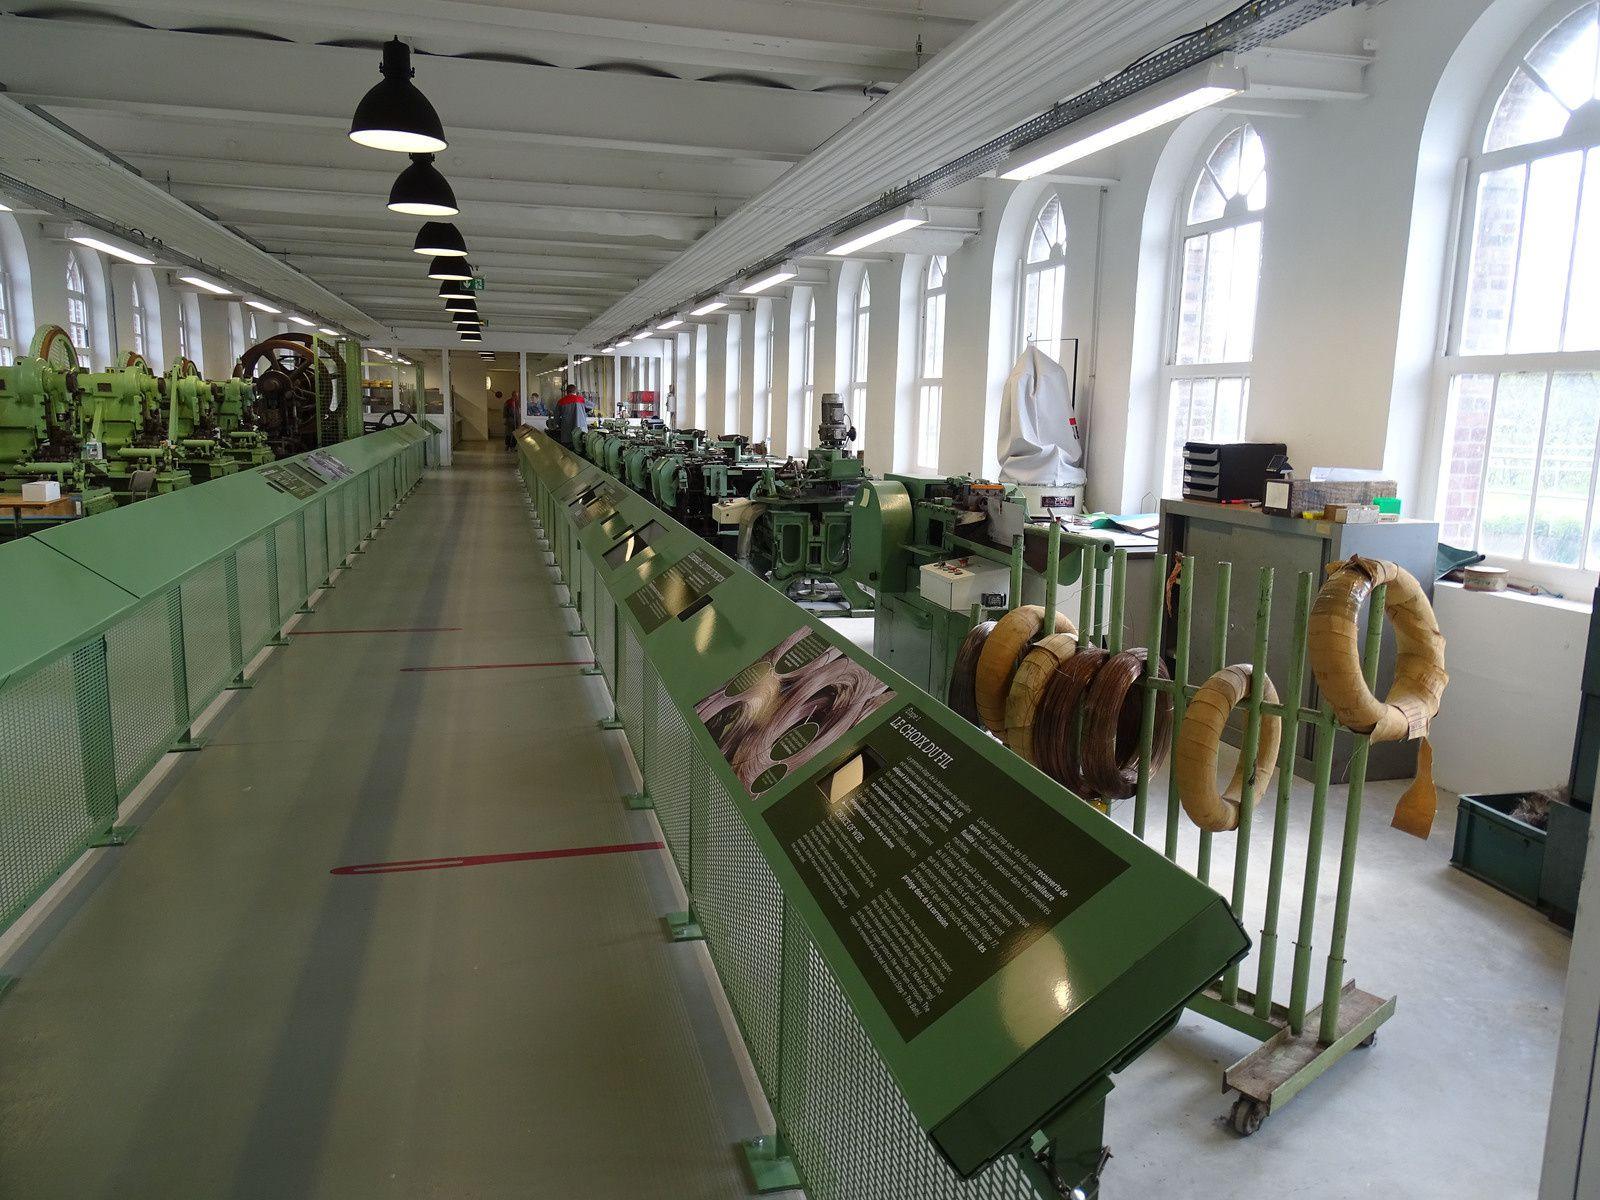 Promenade et visite de la Manufacture Bohin